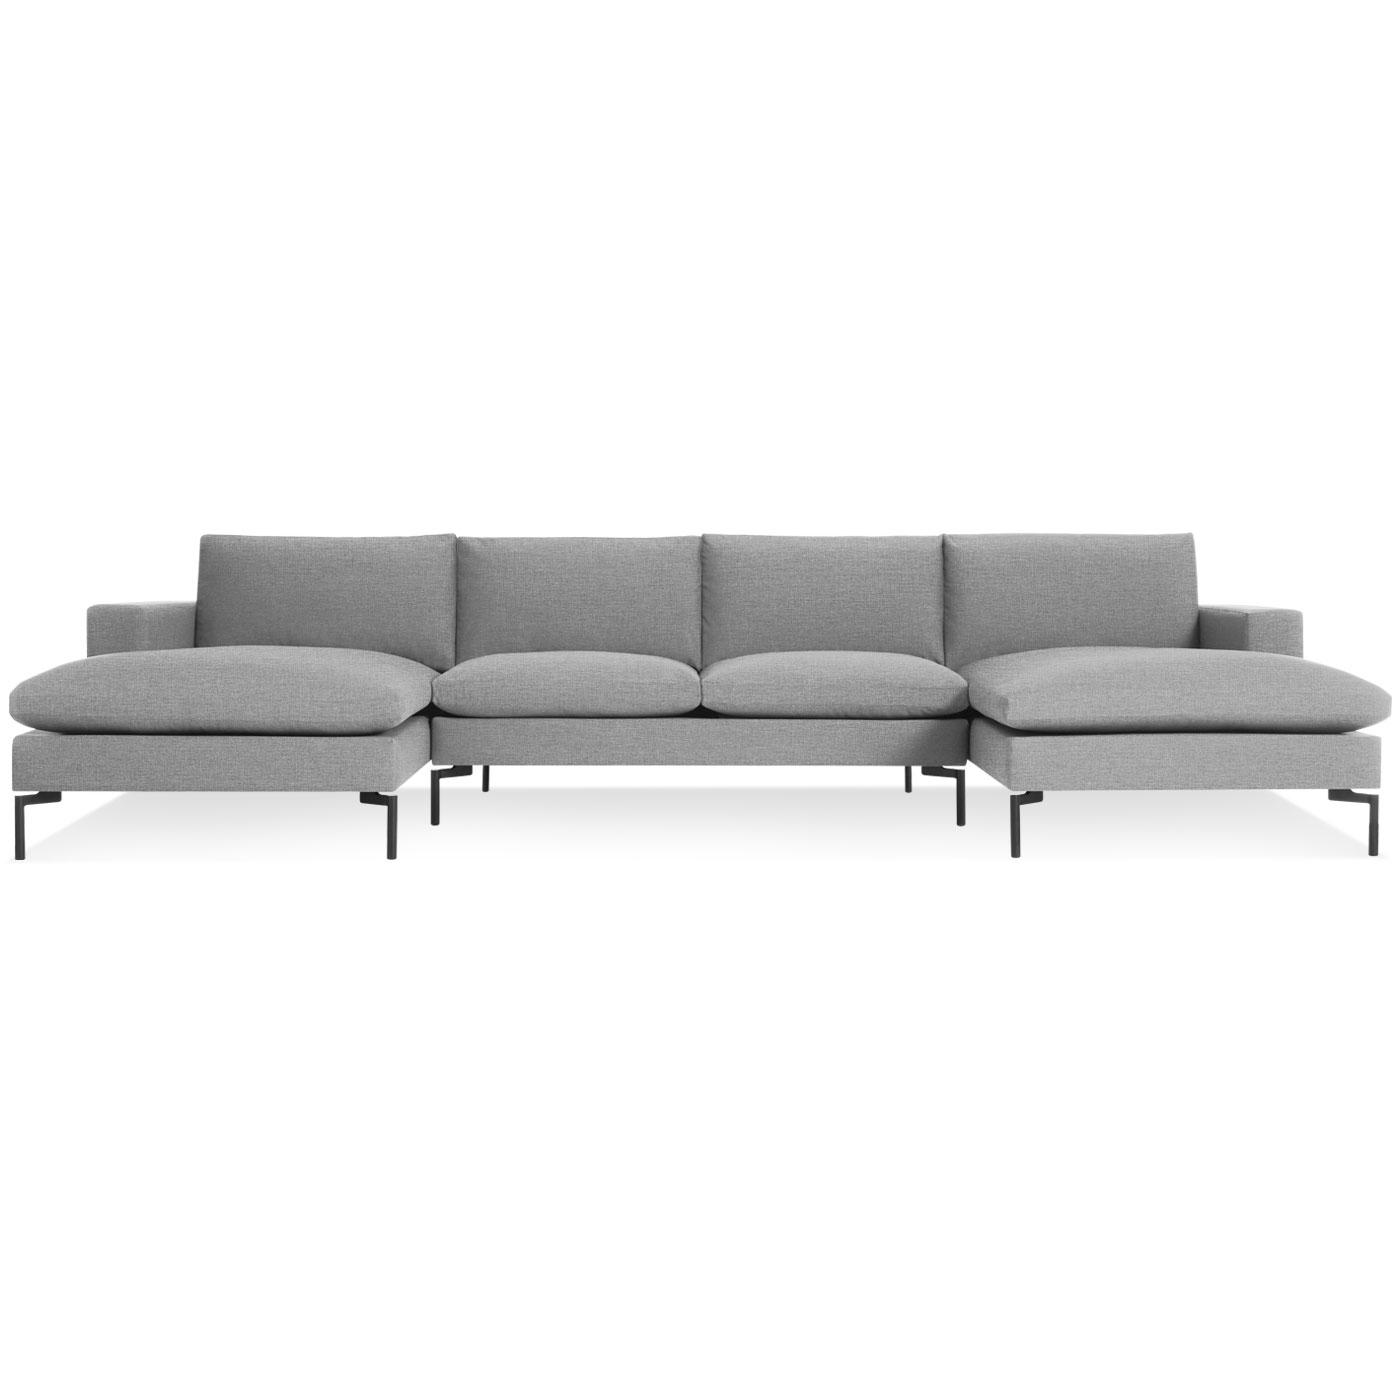 New Standard Modern U Shaped Sectional Sofa | Blu Dot Intended For Modern U Shaped Sectionals (View 9 of 10)